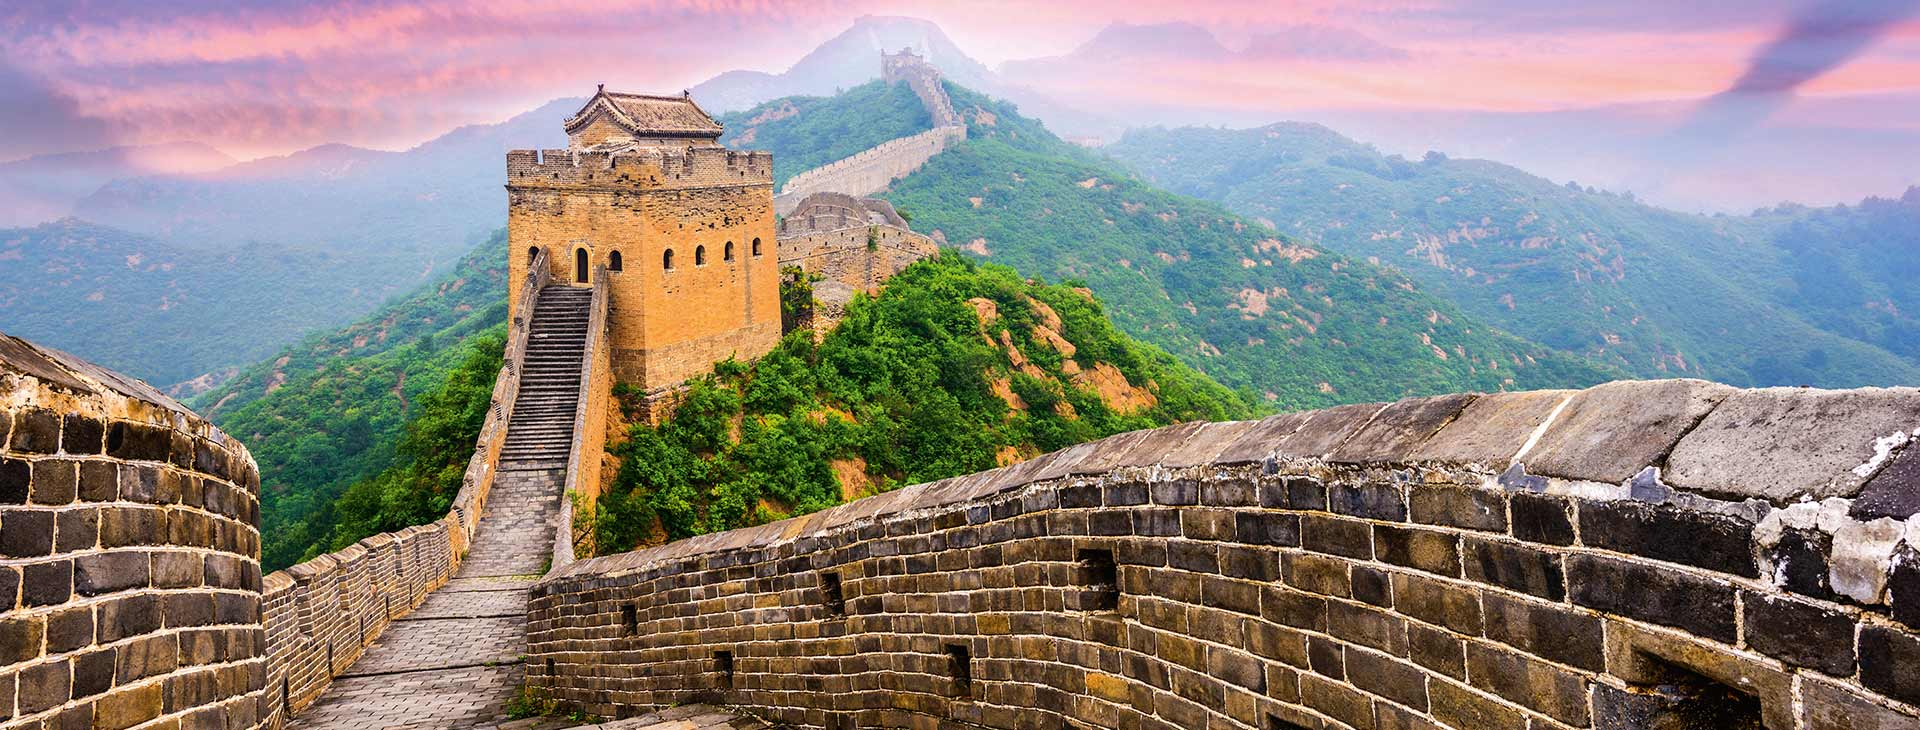 Chiny - Historia i technologia Chiny Wyc. objazdowe